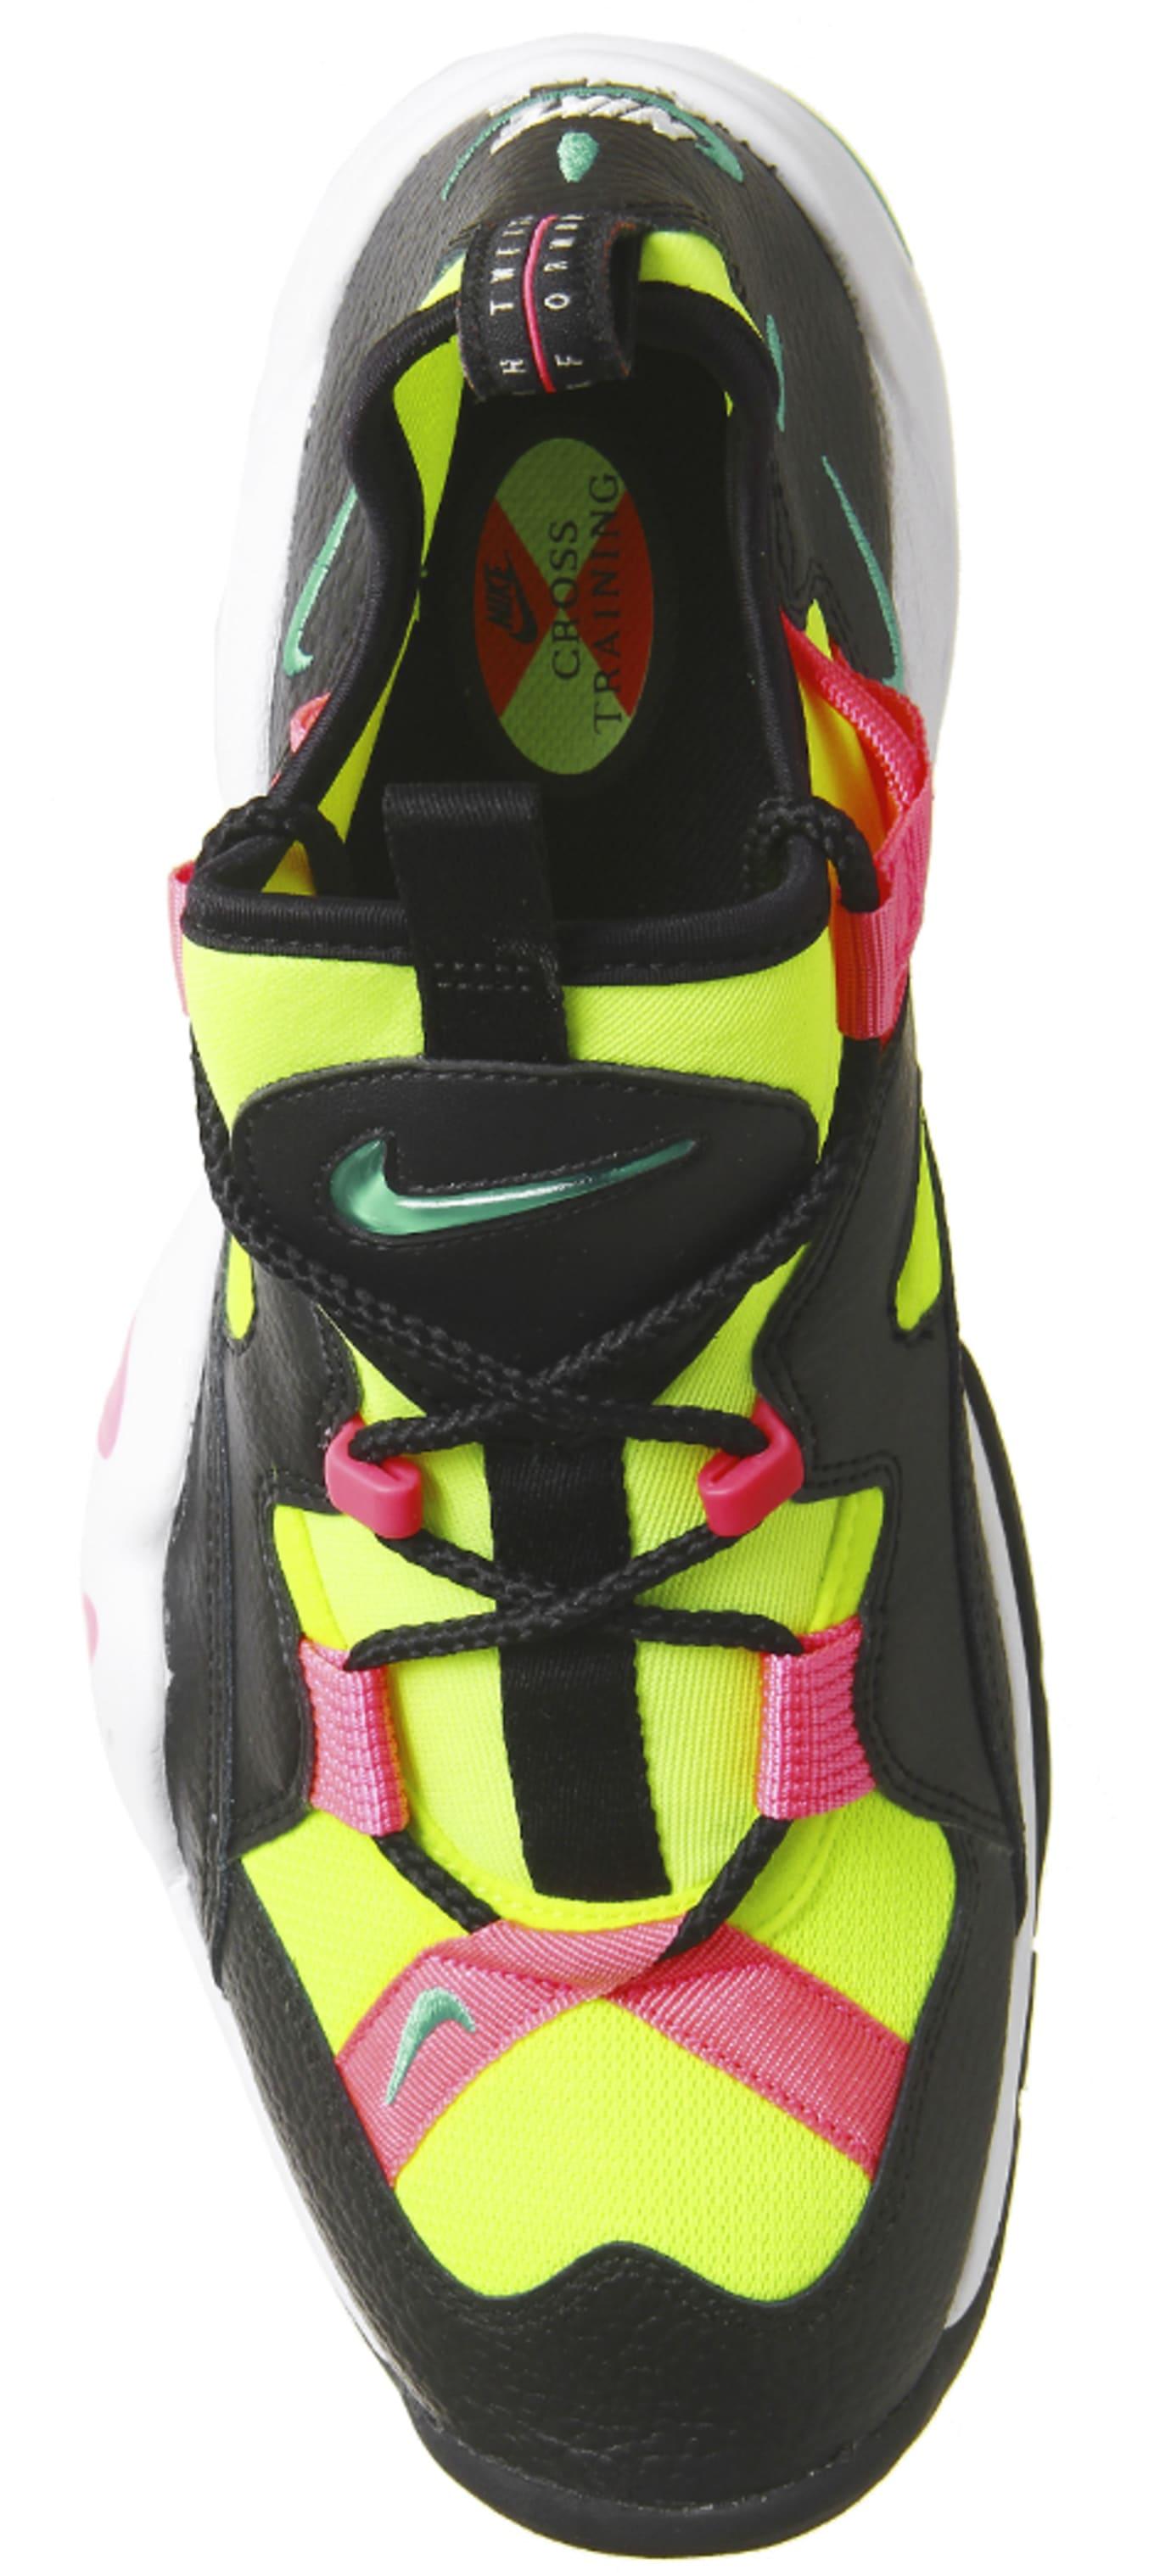 Nike Air Scream LWP 'Black/Menta/Racer Pink' (Top)